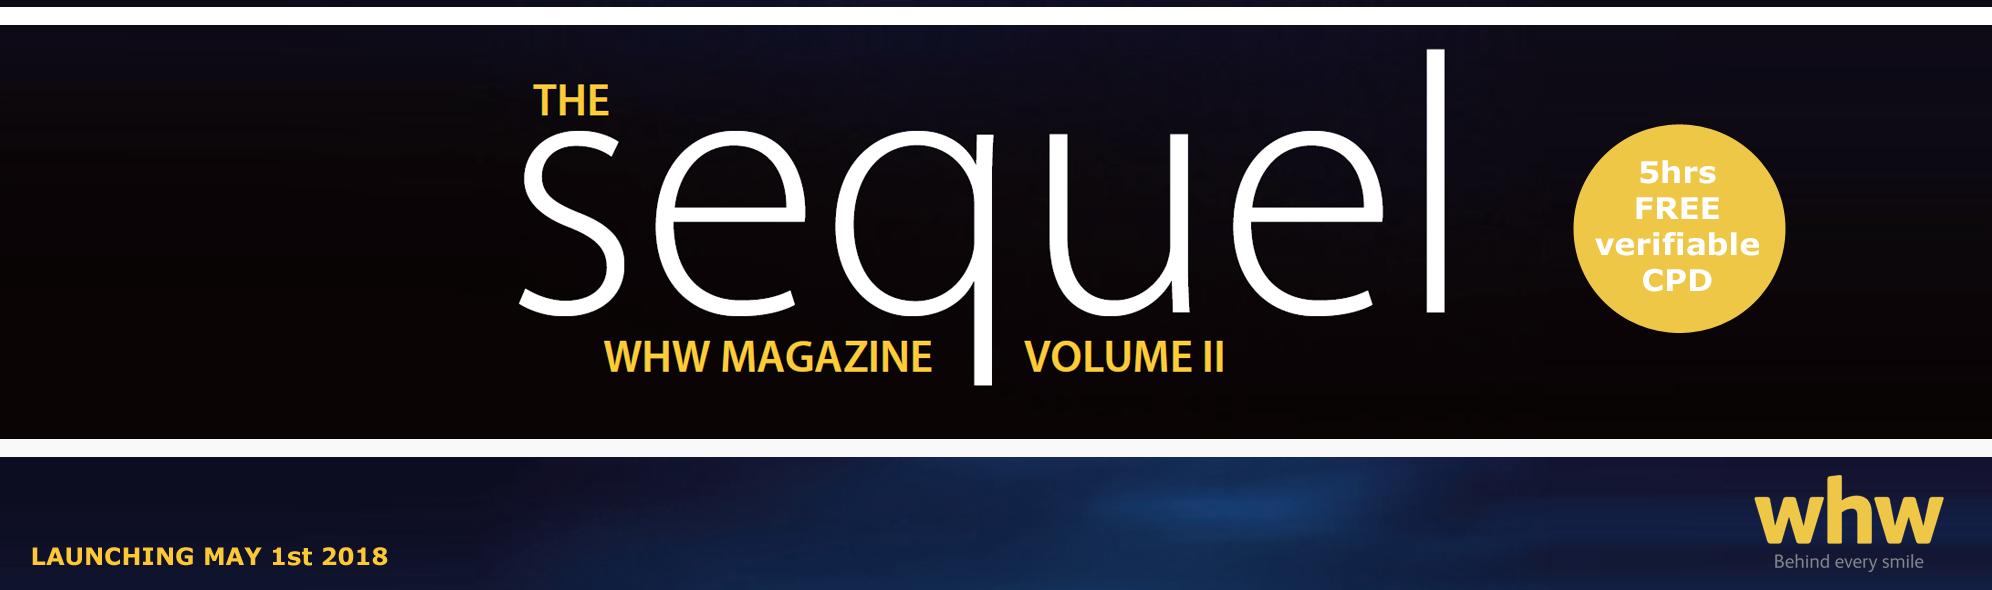 WHW magazine volume II